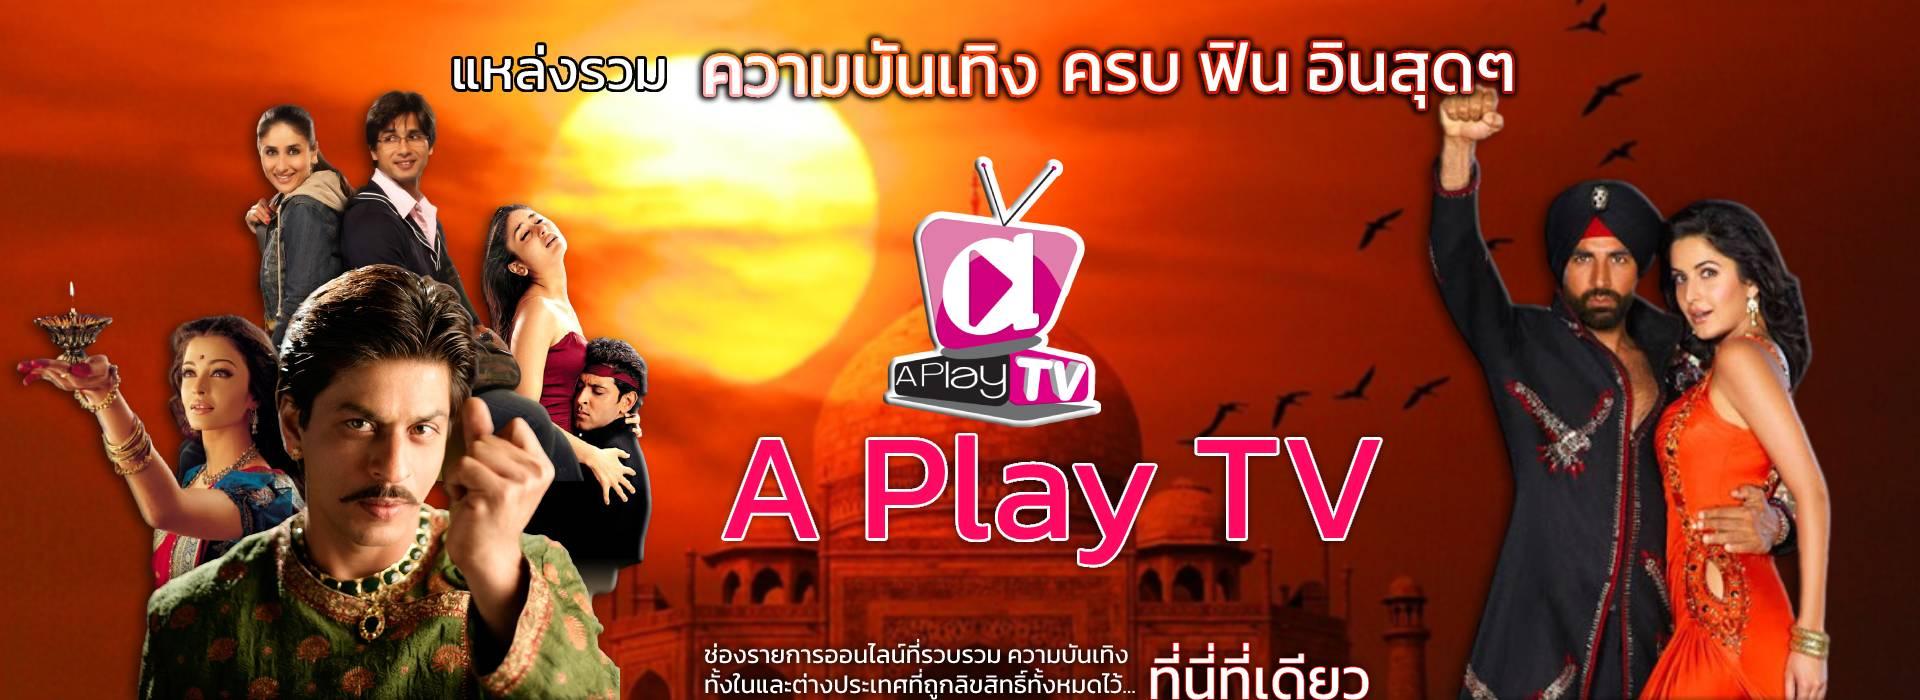 banner broadcast aplaytv